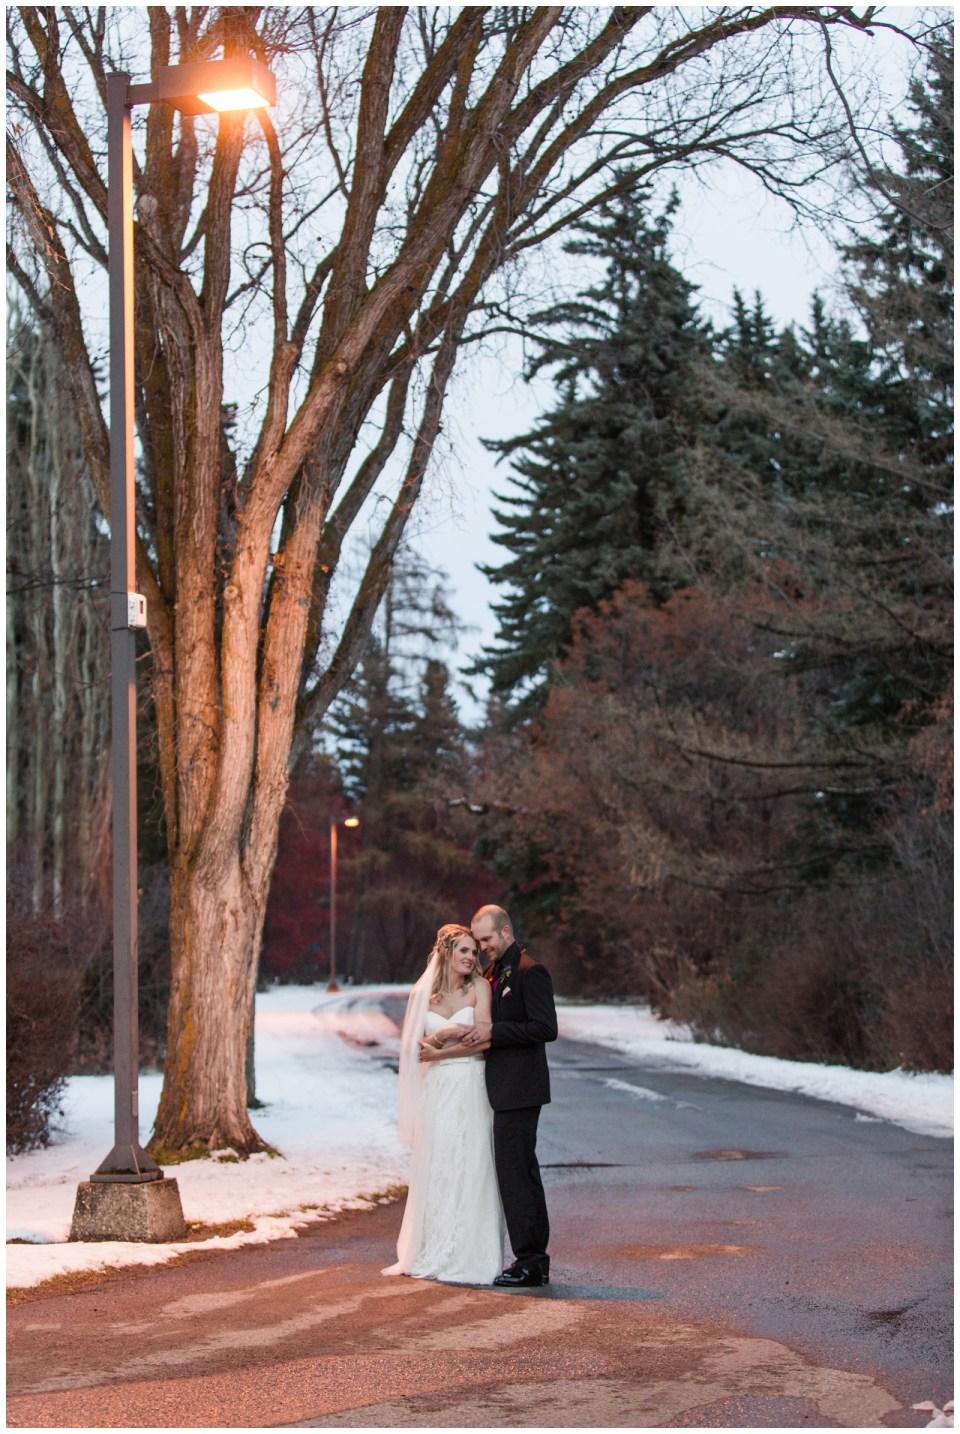 Winter Wedding at Track on 2 Lacombe Alberta